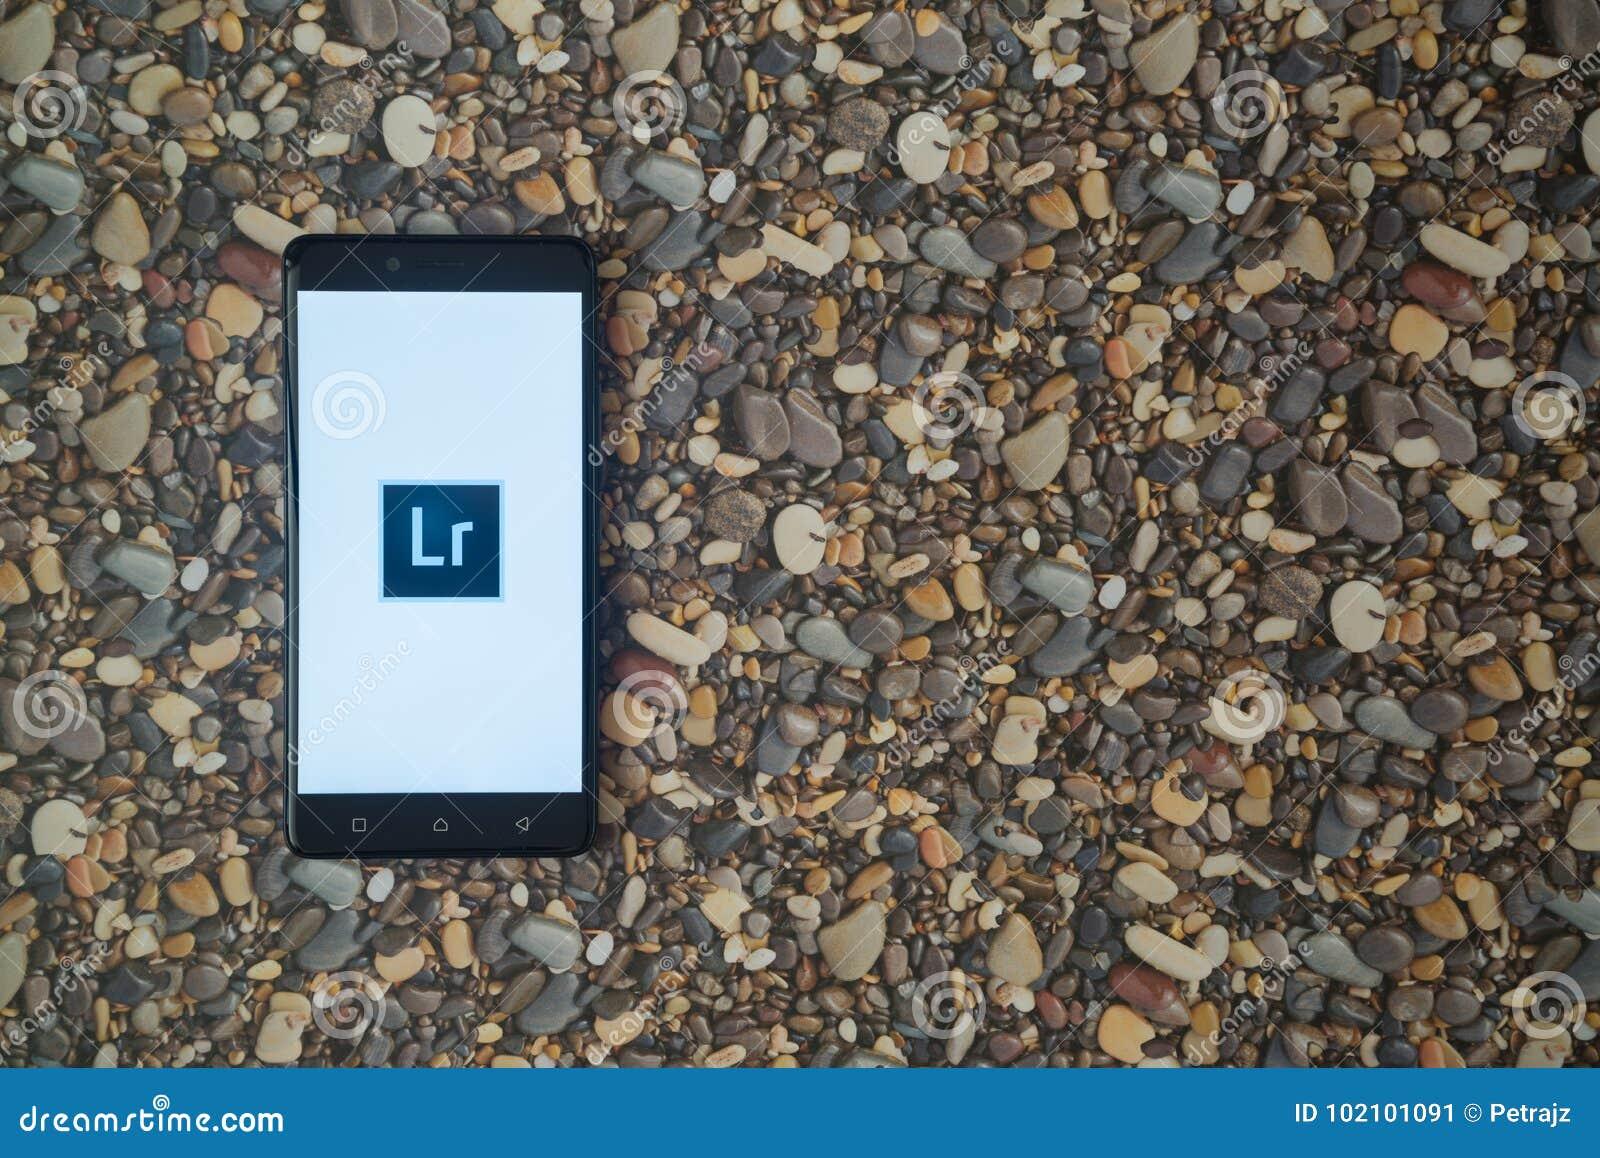 Adobe Photoshop Lightroom Logo On Smartphone On Background Of Small